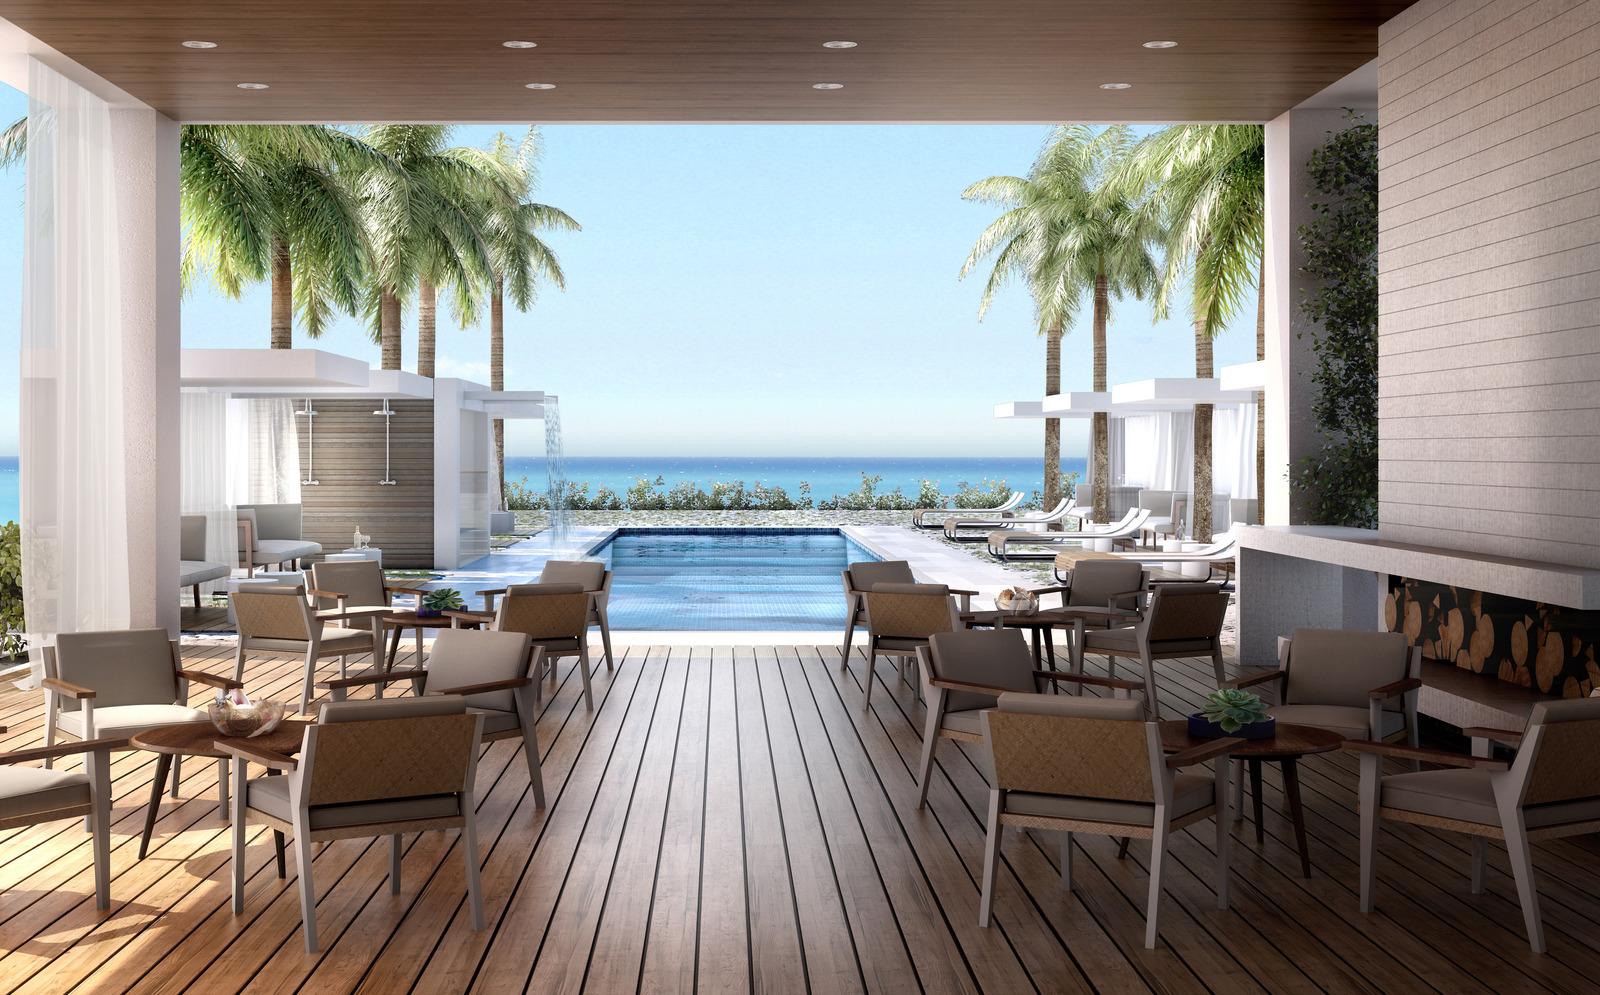 Beach house 8 miami pool deck new build homesnew build homes for Soho oviedo